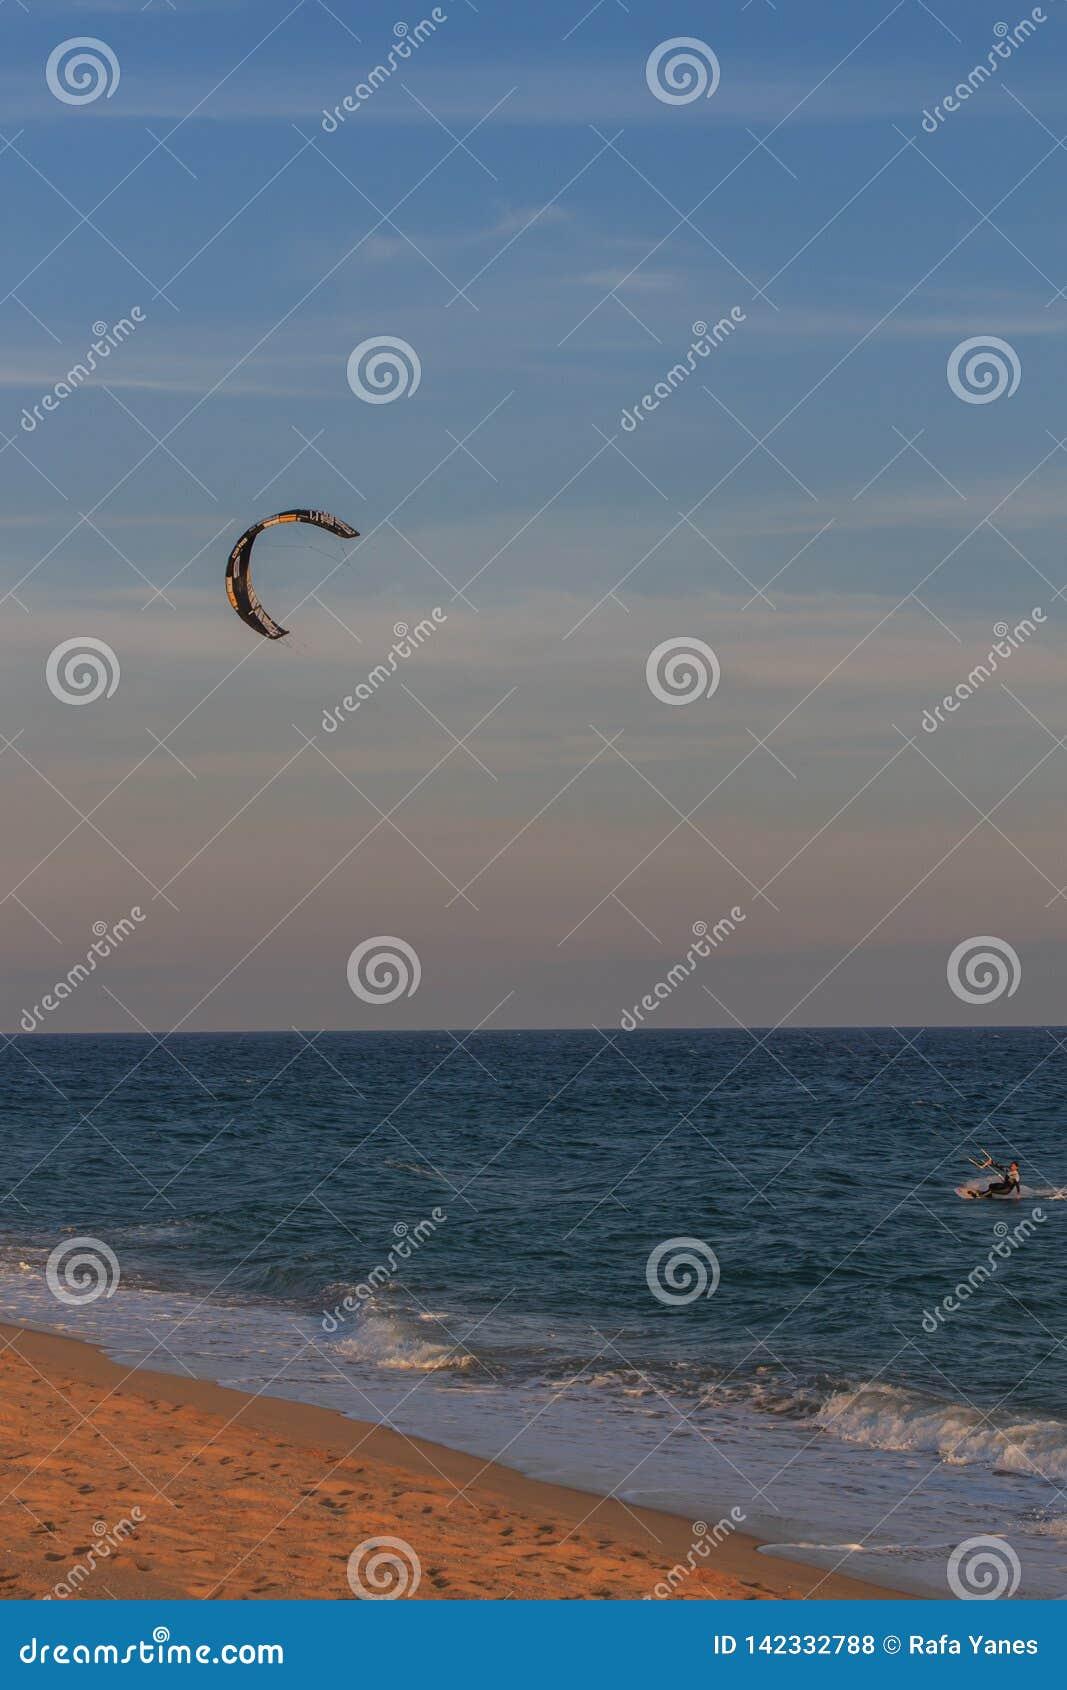 Cabrera de Mar, Βαρκελώνη/Ισπανία  02 08 2019: Ένα καλό απόγευμα στην πρακτική Windsurfing και Kitesurfing Flysurf στην παραλία C